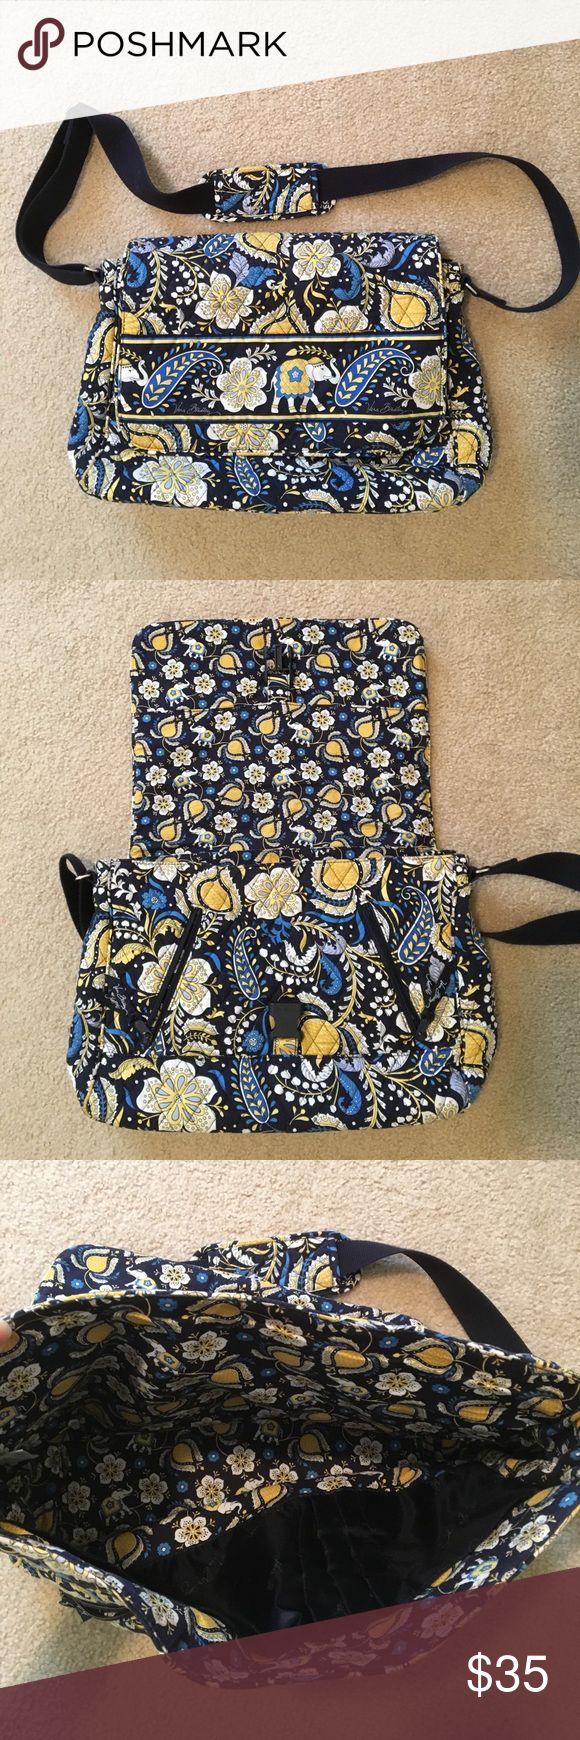 Vera Cross body Satchel! Vera Bradley cross body, great for school or work. Hardly used, just like new. Vera Bradley Bags Crossbody Bags